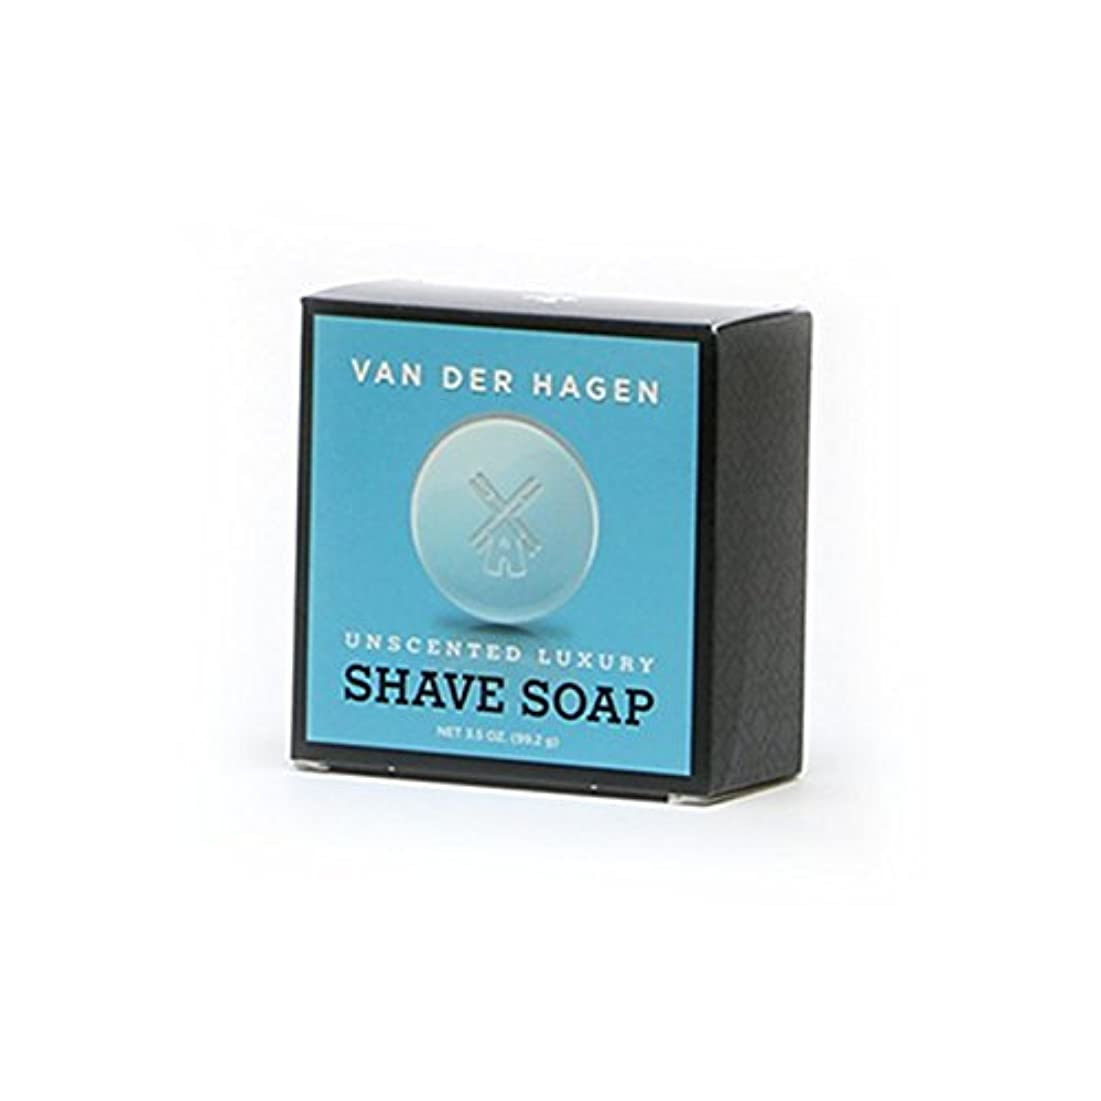 VANDERHAGEN(米) シェービングソープ 剃刀負けしにくい 無香料 髭剃り用石鹸